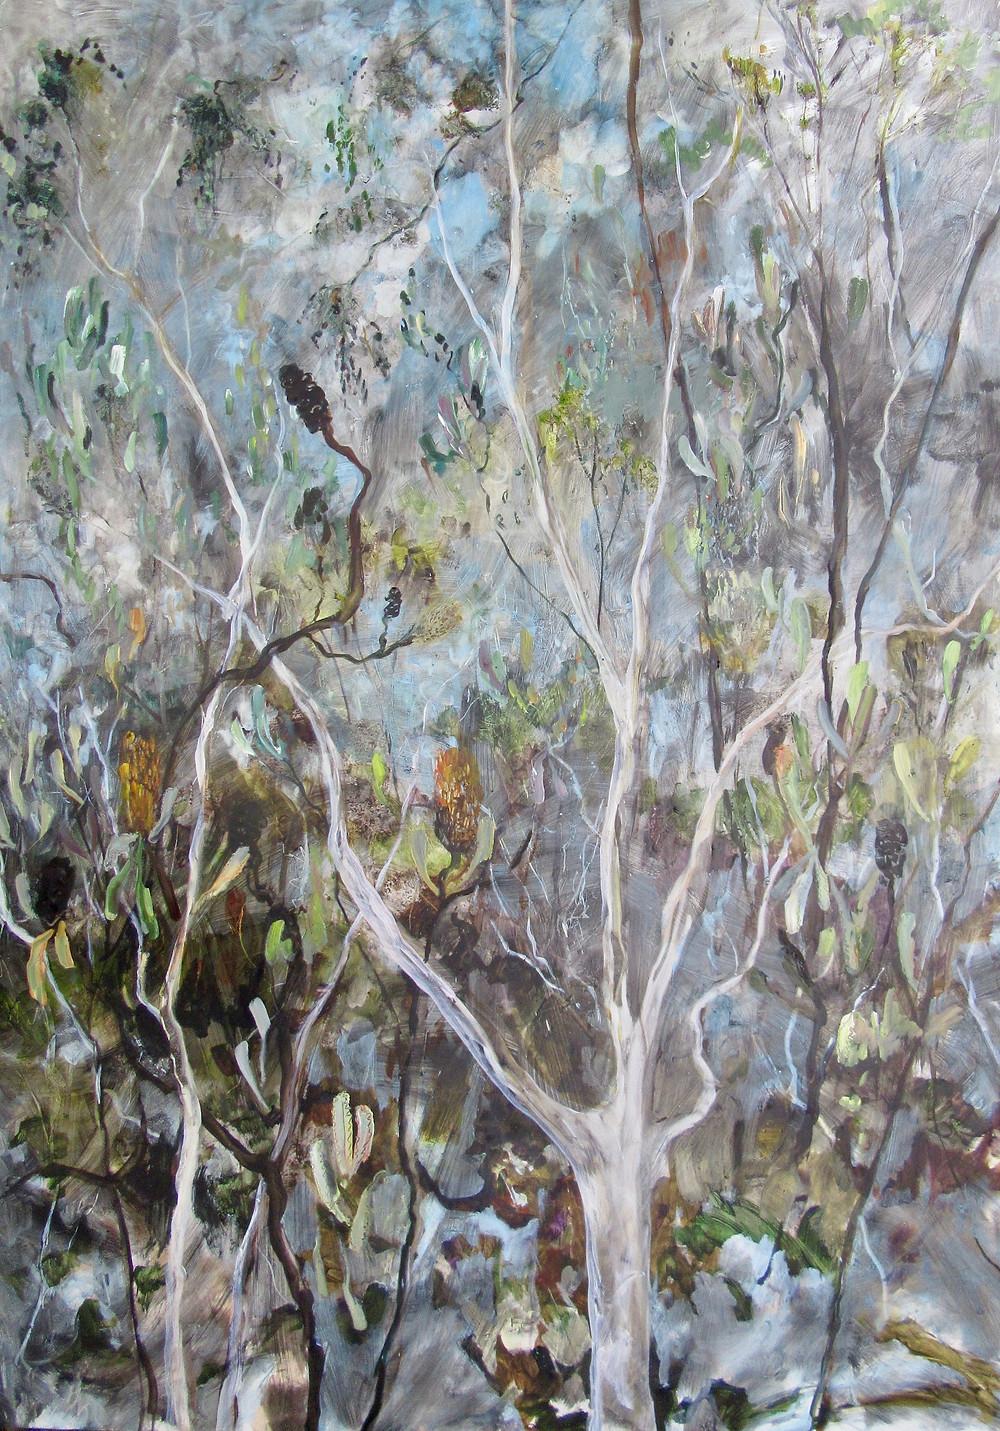 A Walk Through the Trees, Oil on Board, 140 x 100cm